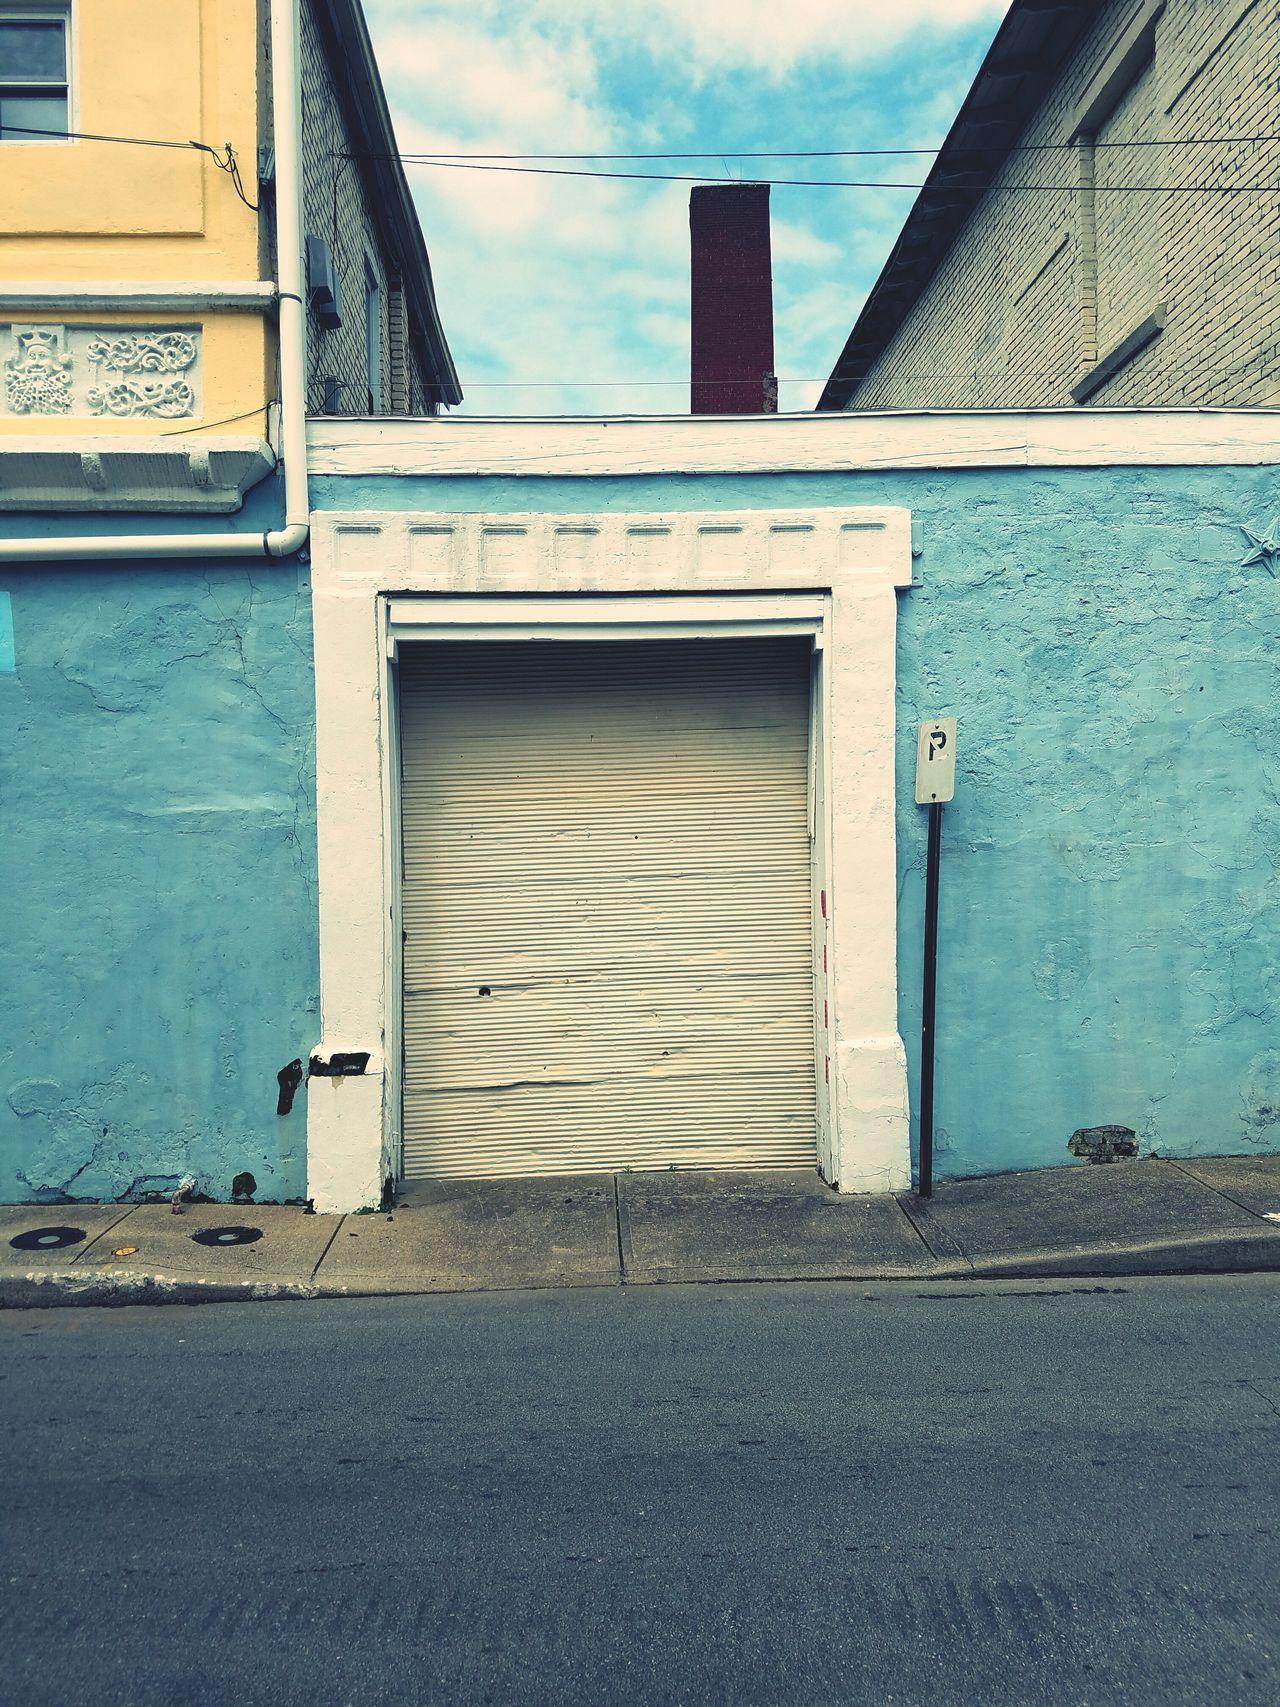 Garage Door Metal Door Sidewalk Photograhy Street Photography Streetphoto_color Old Buildings Oldschool Intricatedetails Yellow BuildingBlue Building Blue Building Blue Sky Blue Sky Clouds And Sky Chimneys Downtown